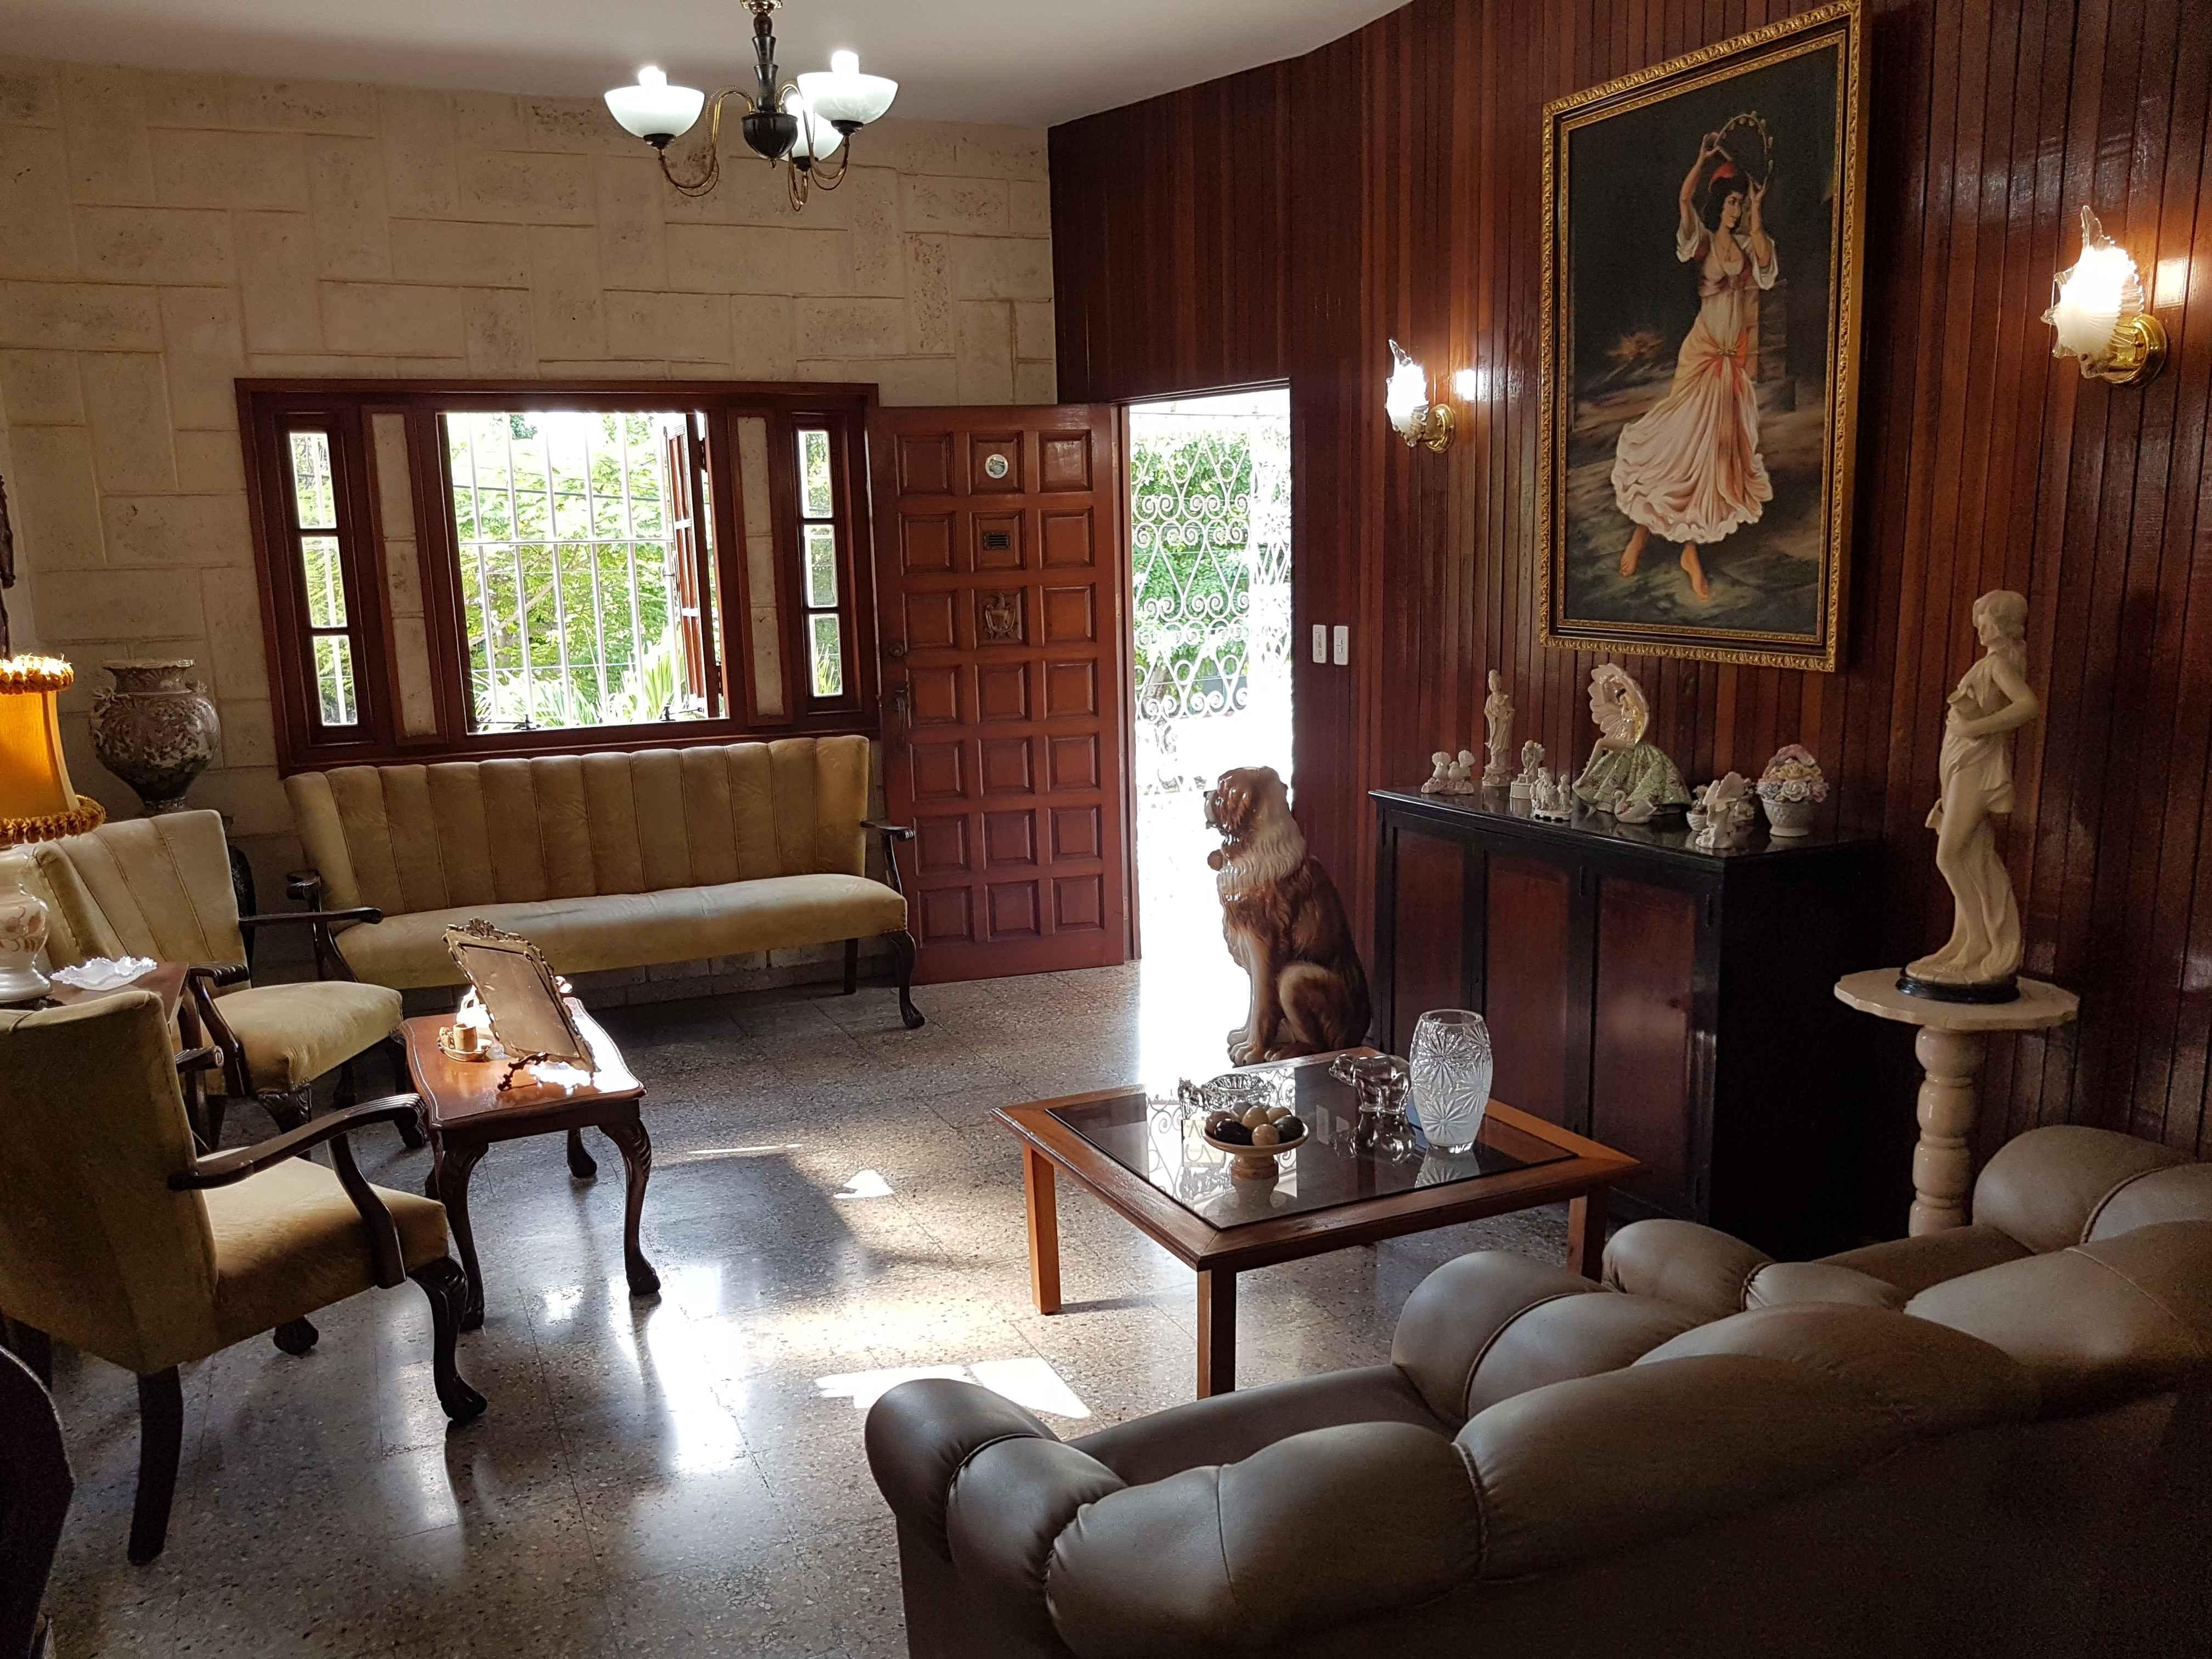 HAV501 - Casa Adria